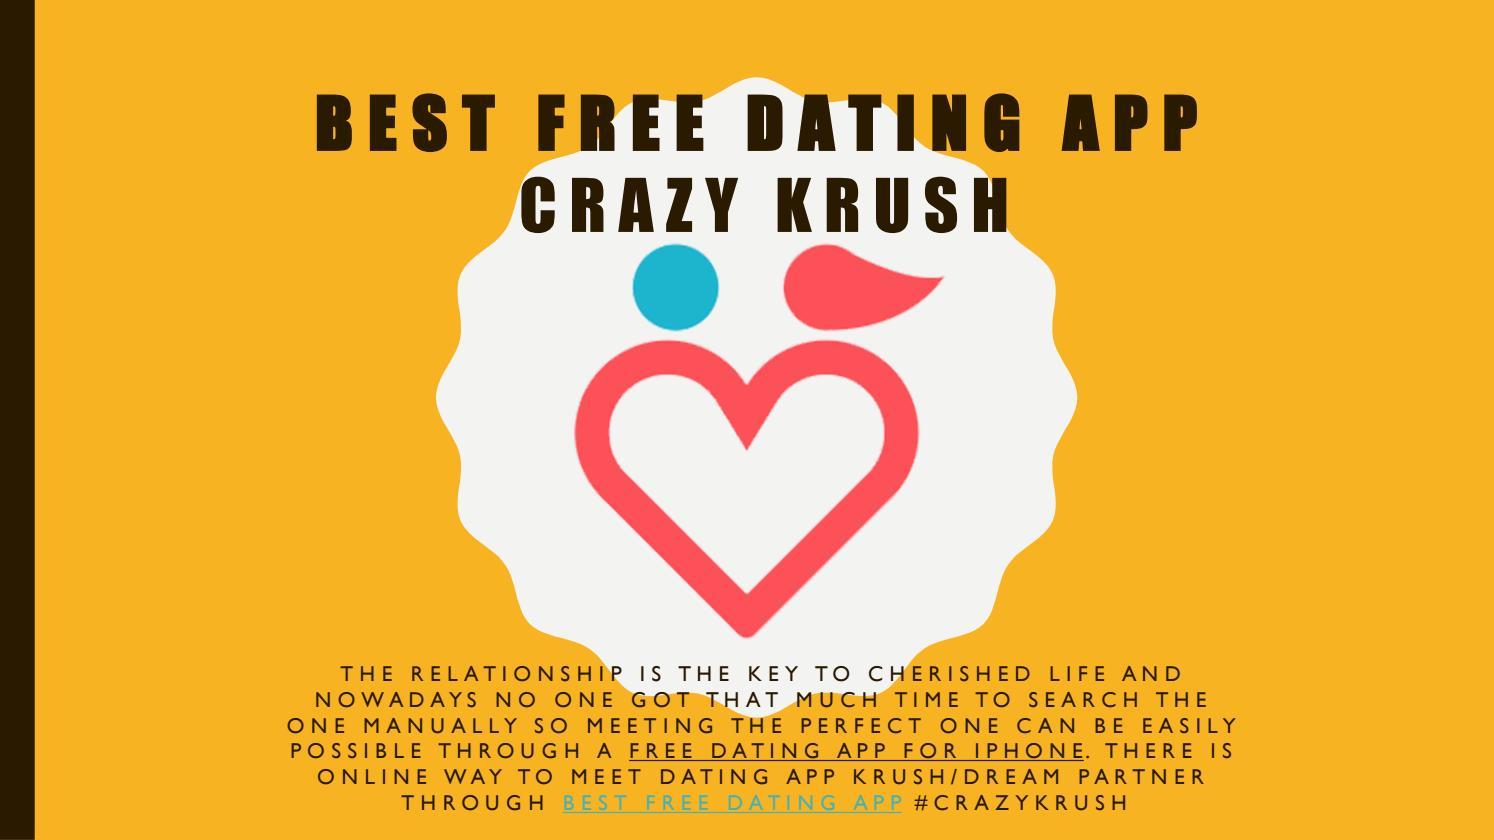 Best Free Dating App crazy krush by Crazy Krush - issuu